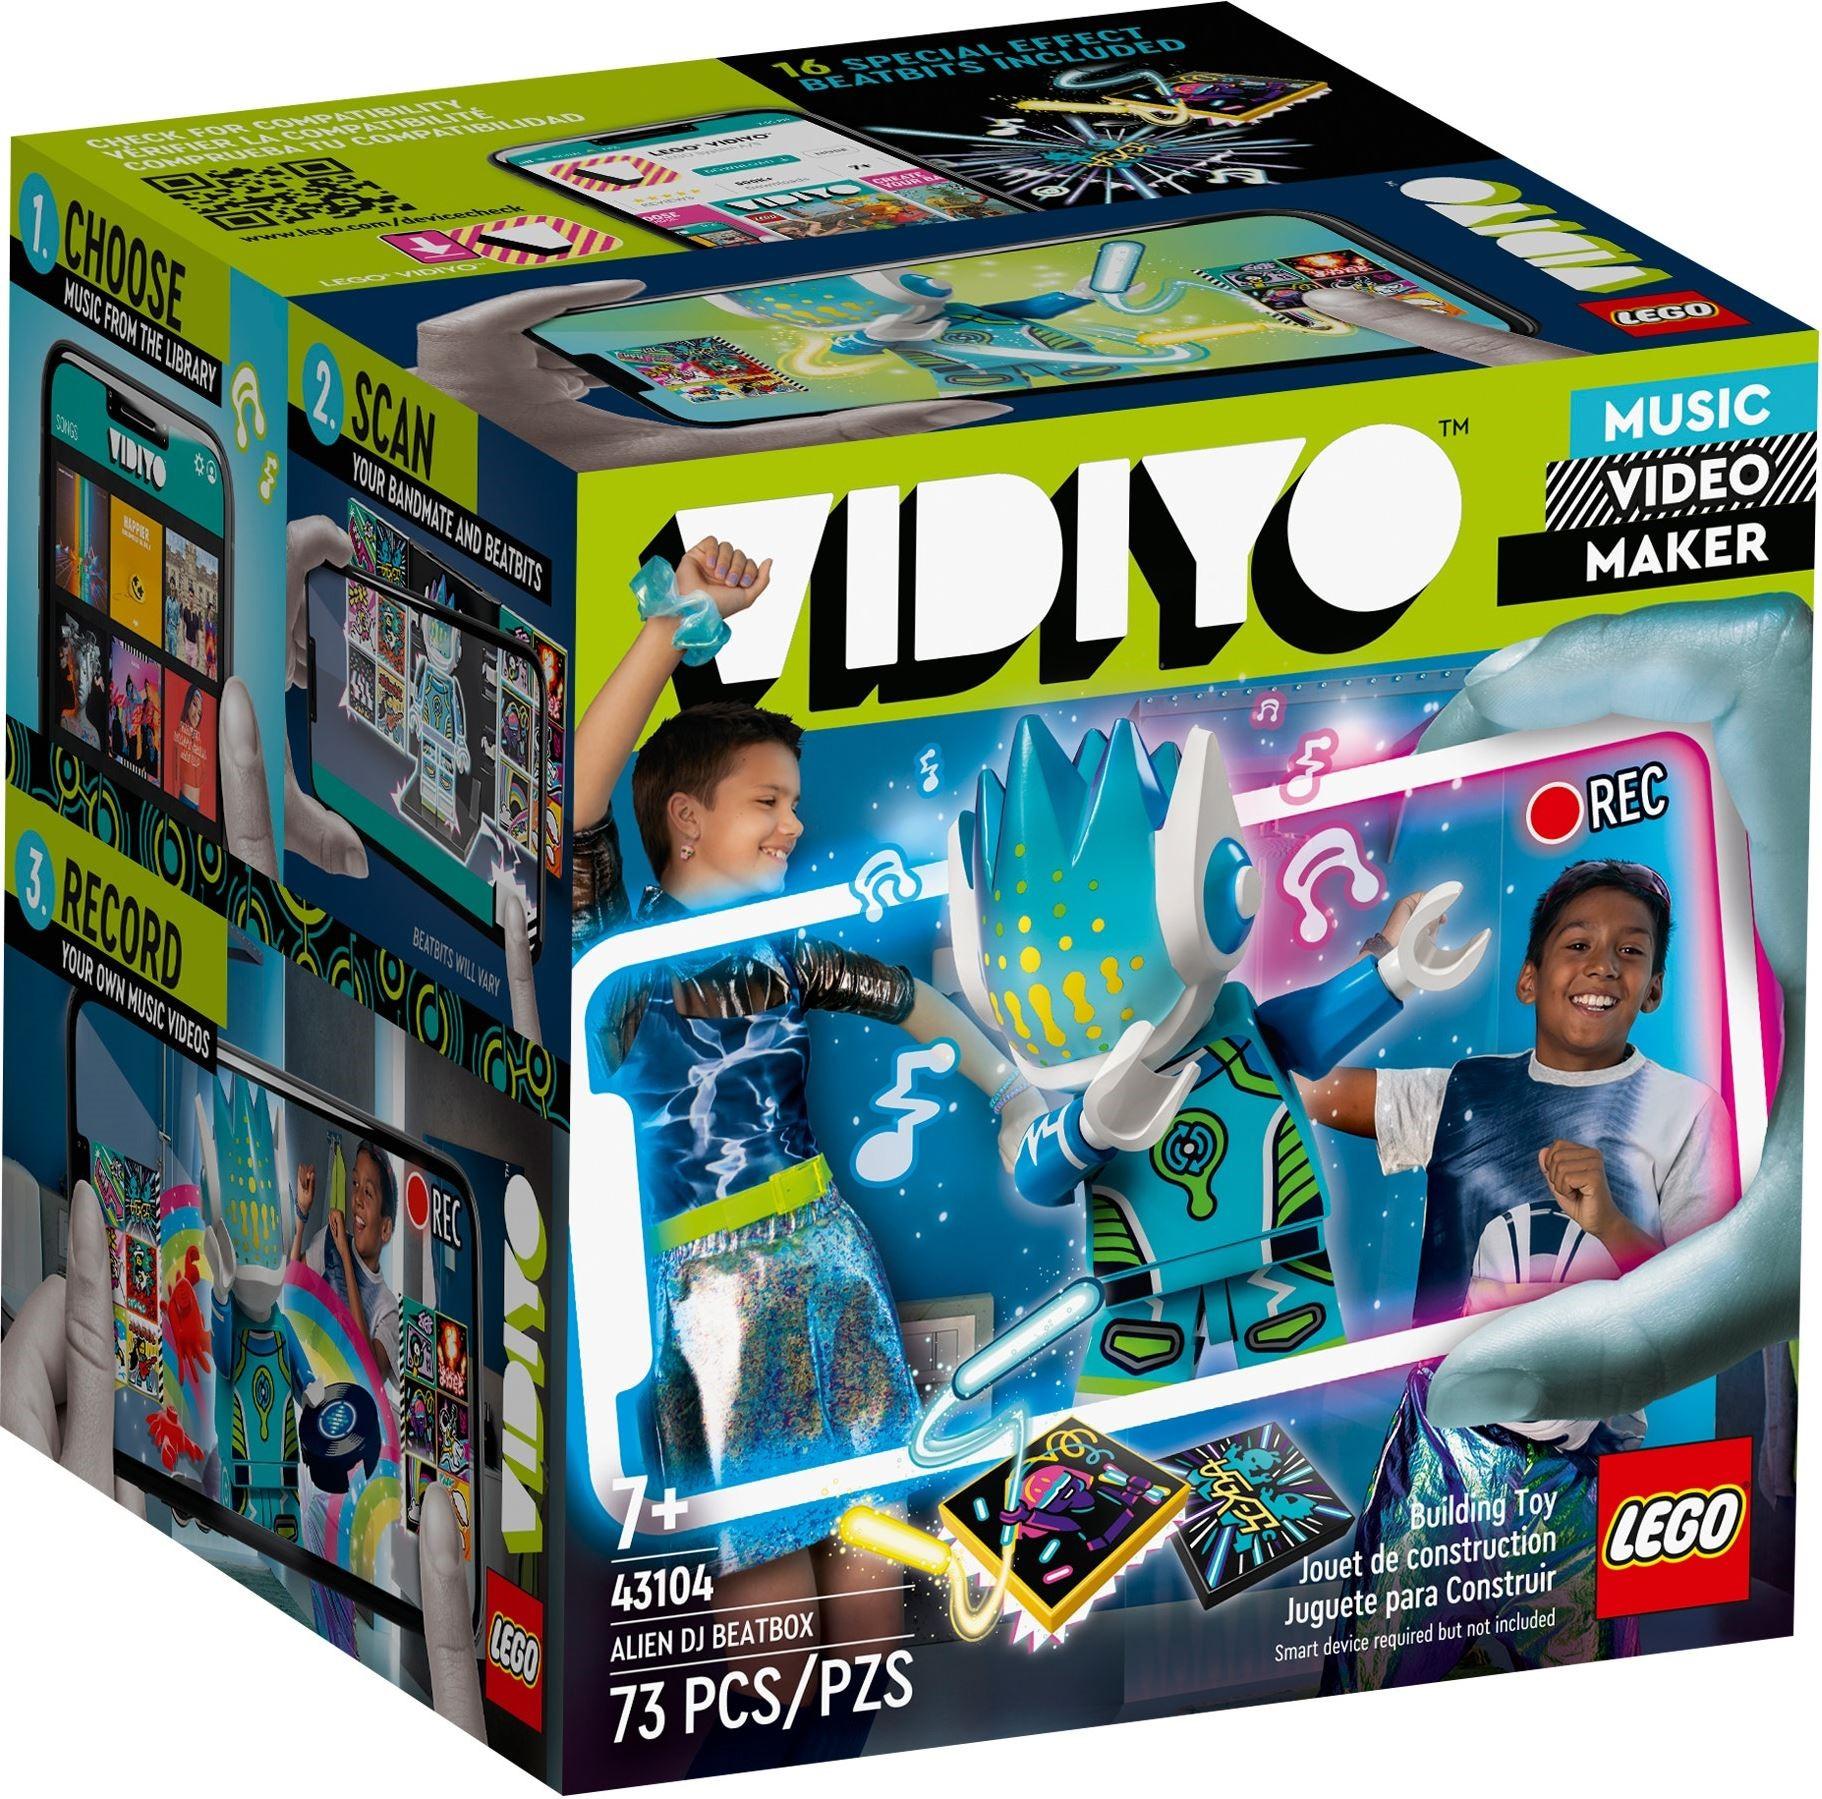 LEGO VIDIYO - Alien DJ BeatBox (43104)